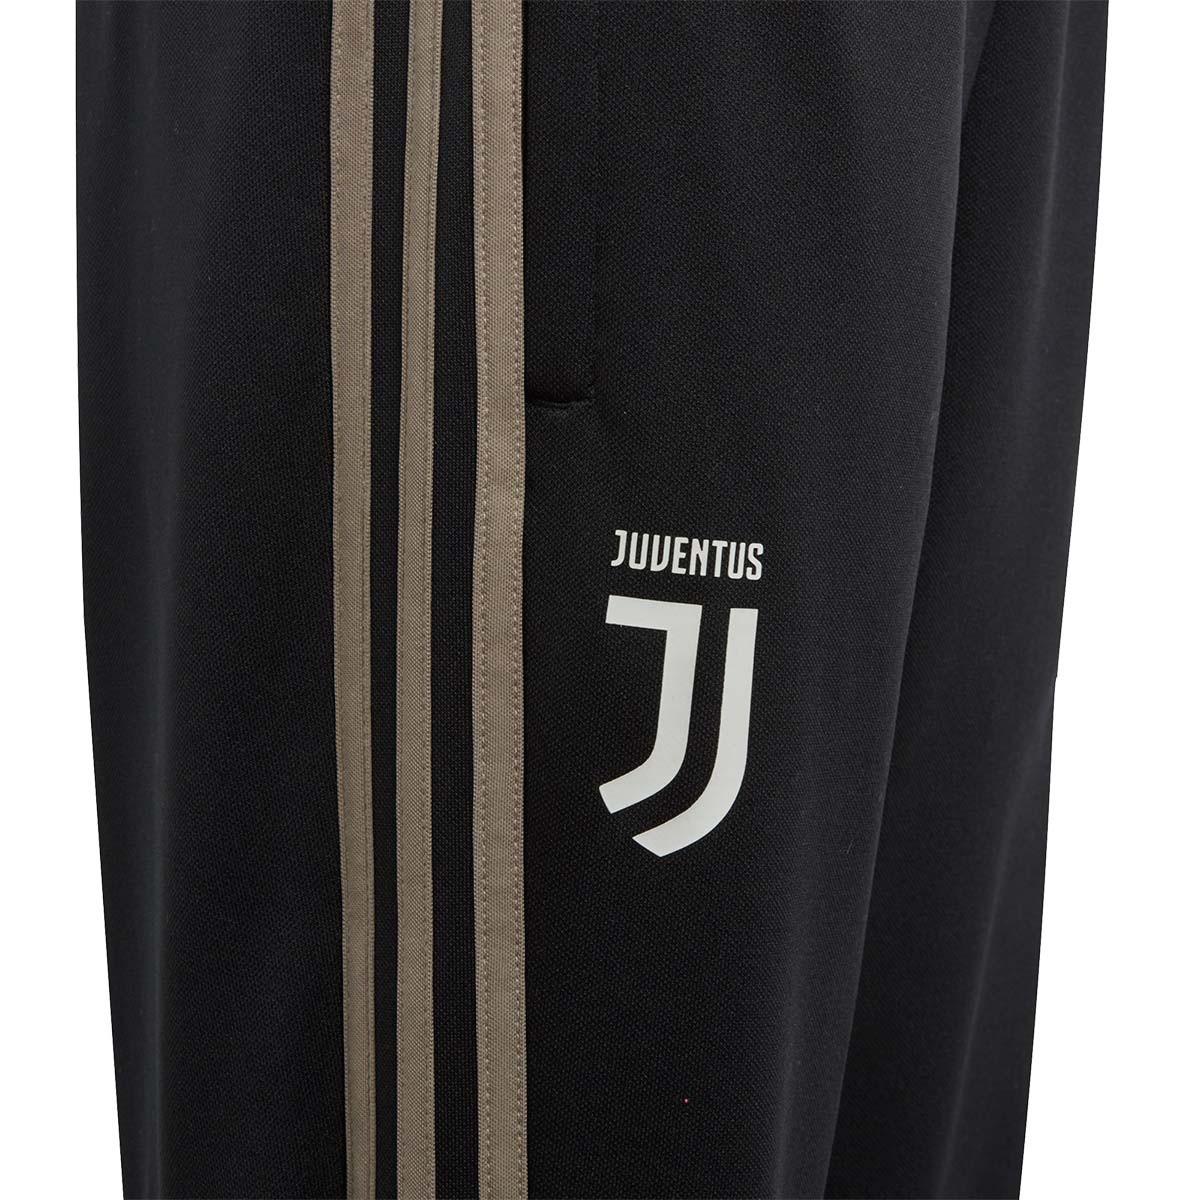 Black Training Juventus Niño Pantalón Largo Clay 2018 2019 Adidas g0qxCOnCtw